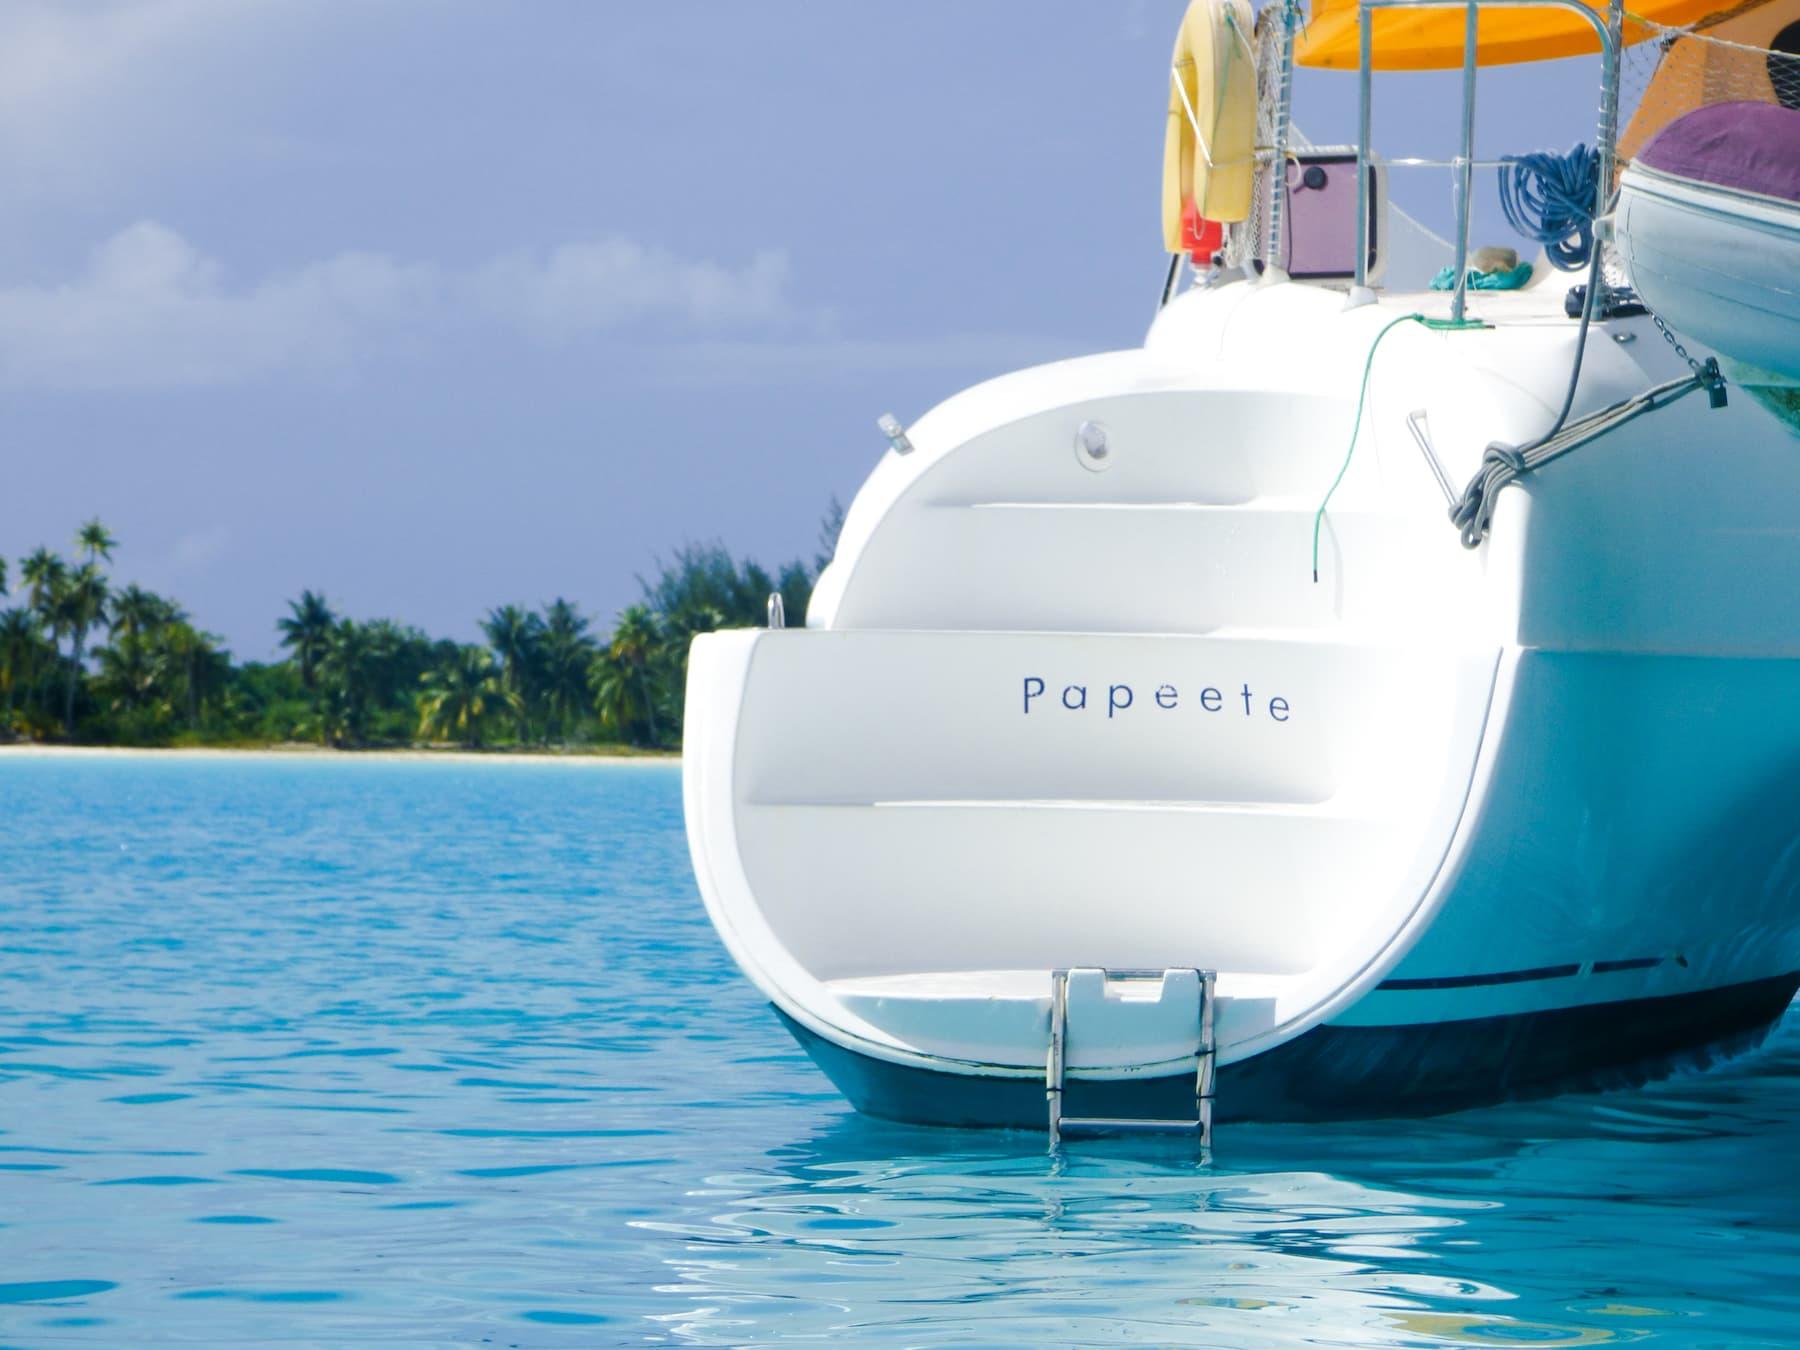 https://tahititourisme.com/wp-content/uploads/2017/08/bateau-tlc-modif-12.jpg